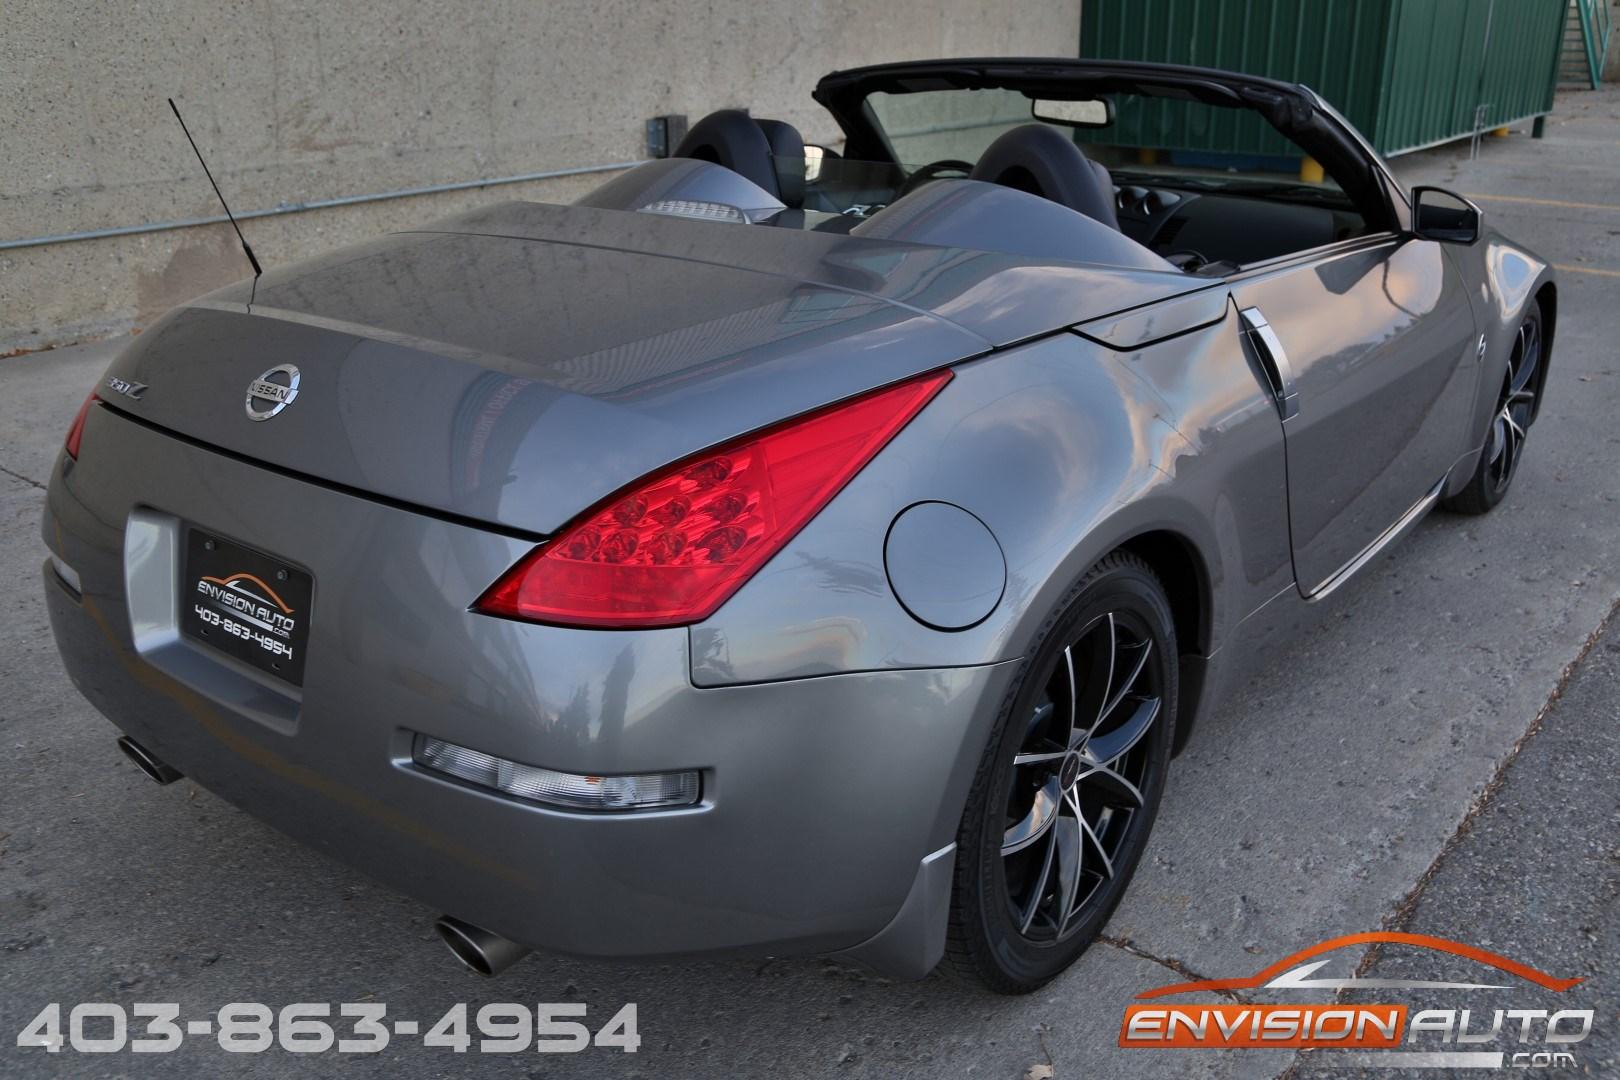 350z nissan 2007 roadster automatic